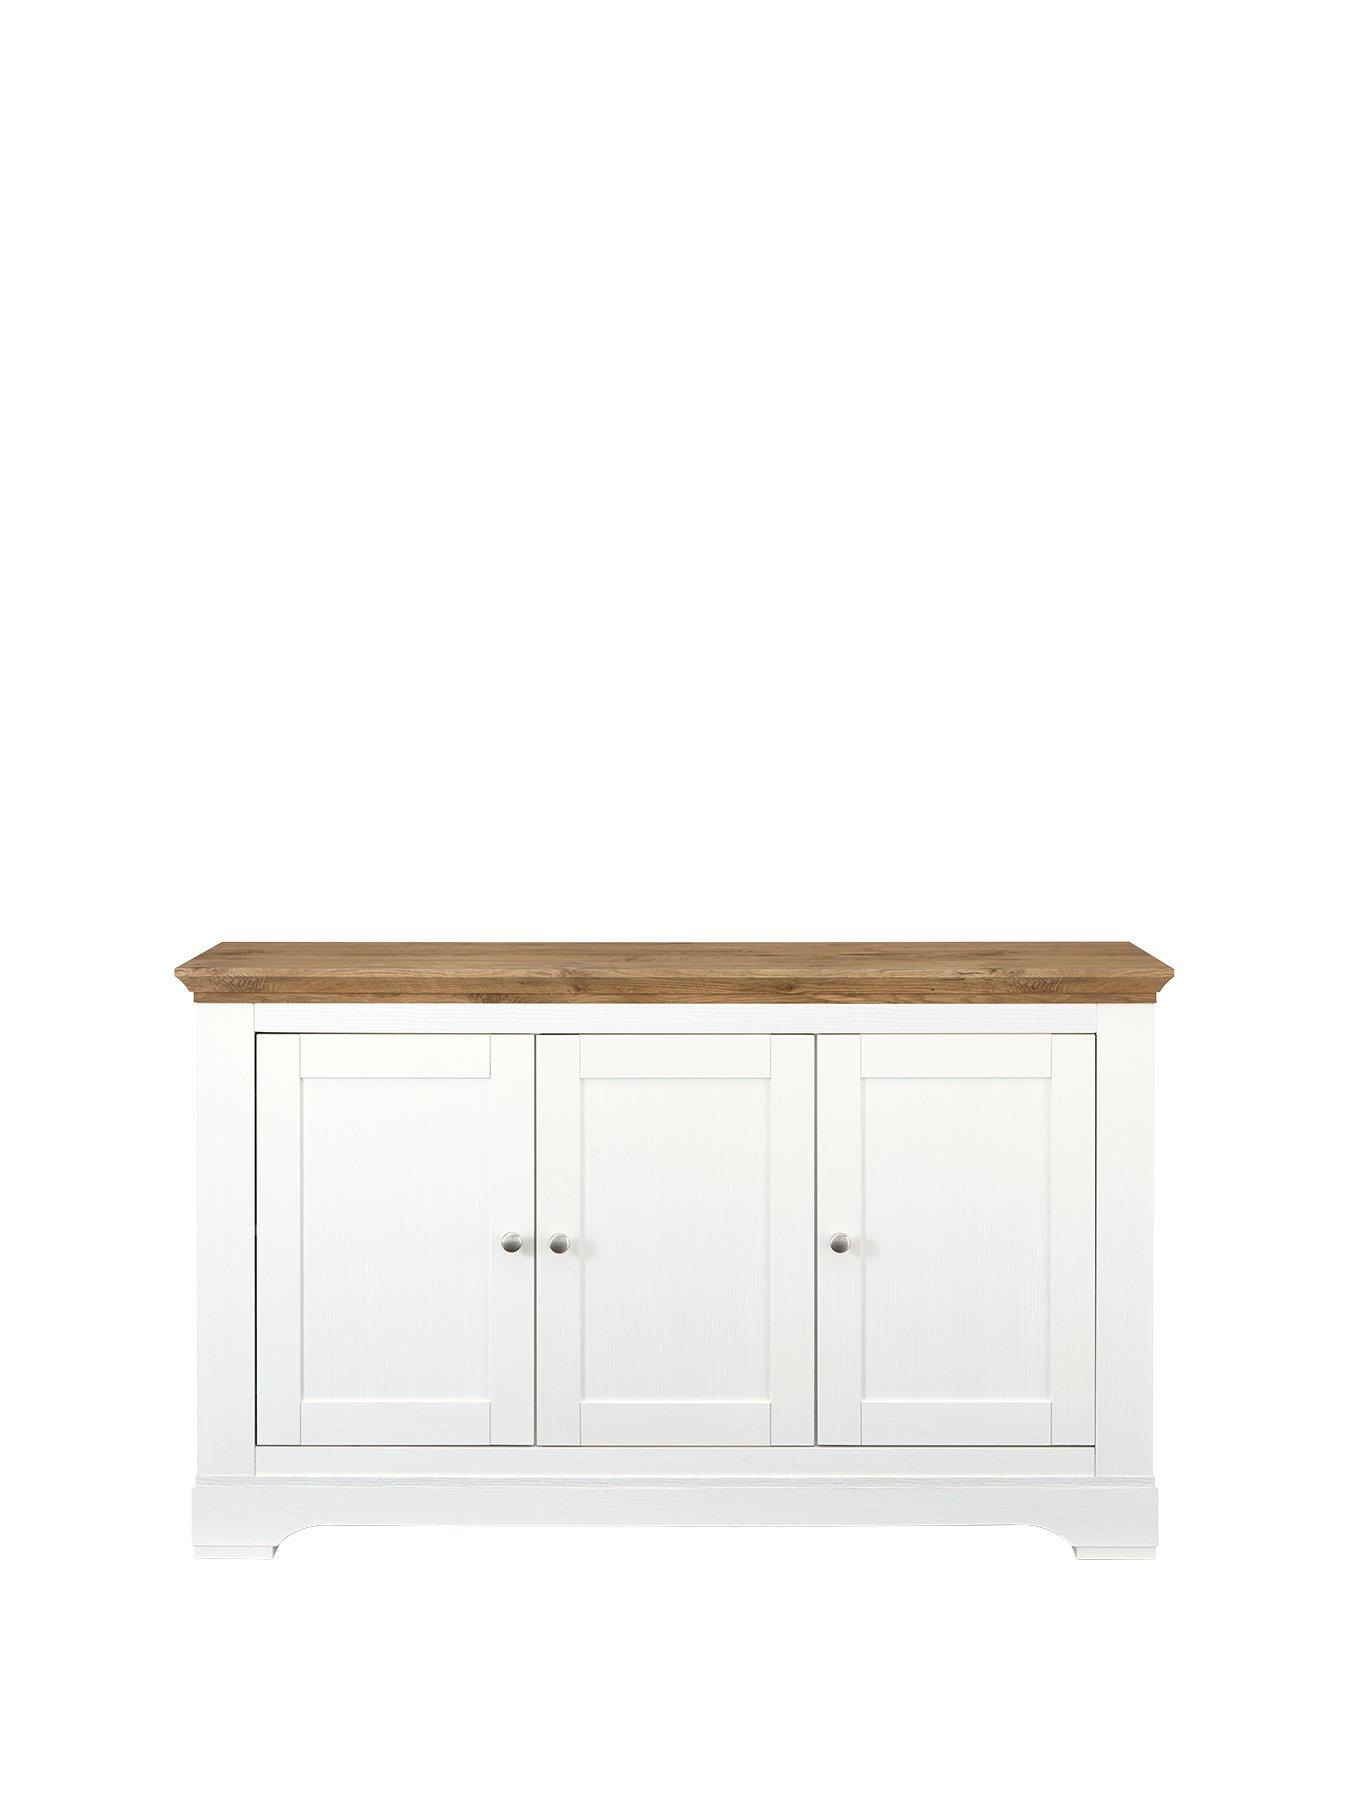 See description Cream and Oak 2 door Compact Sideboard Lancaster Range GRADED